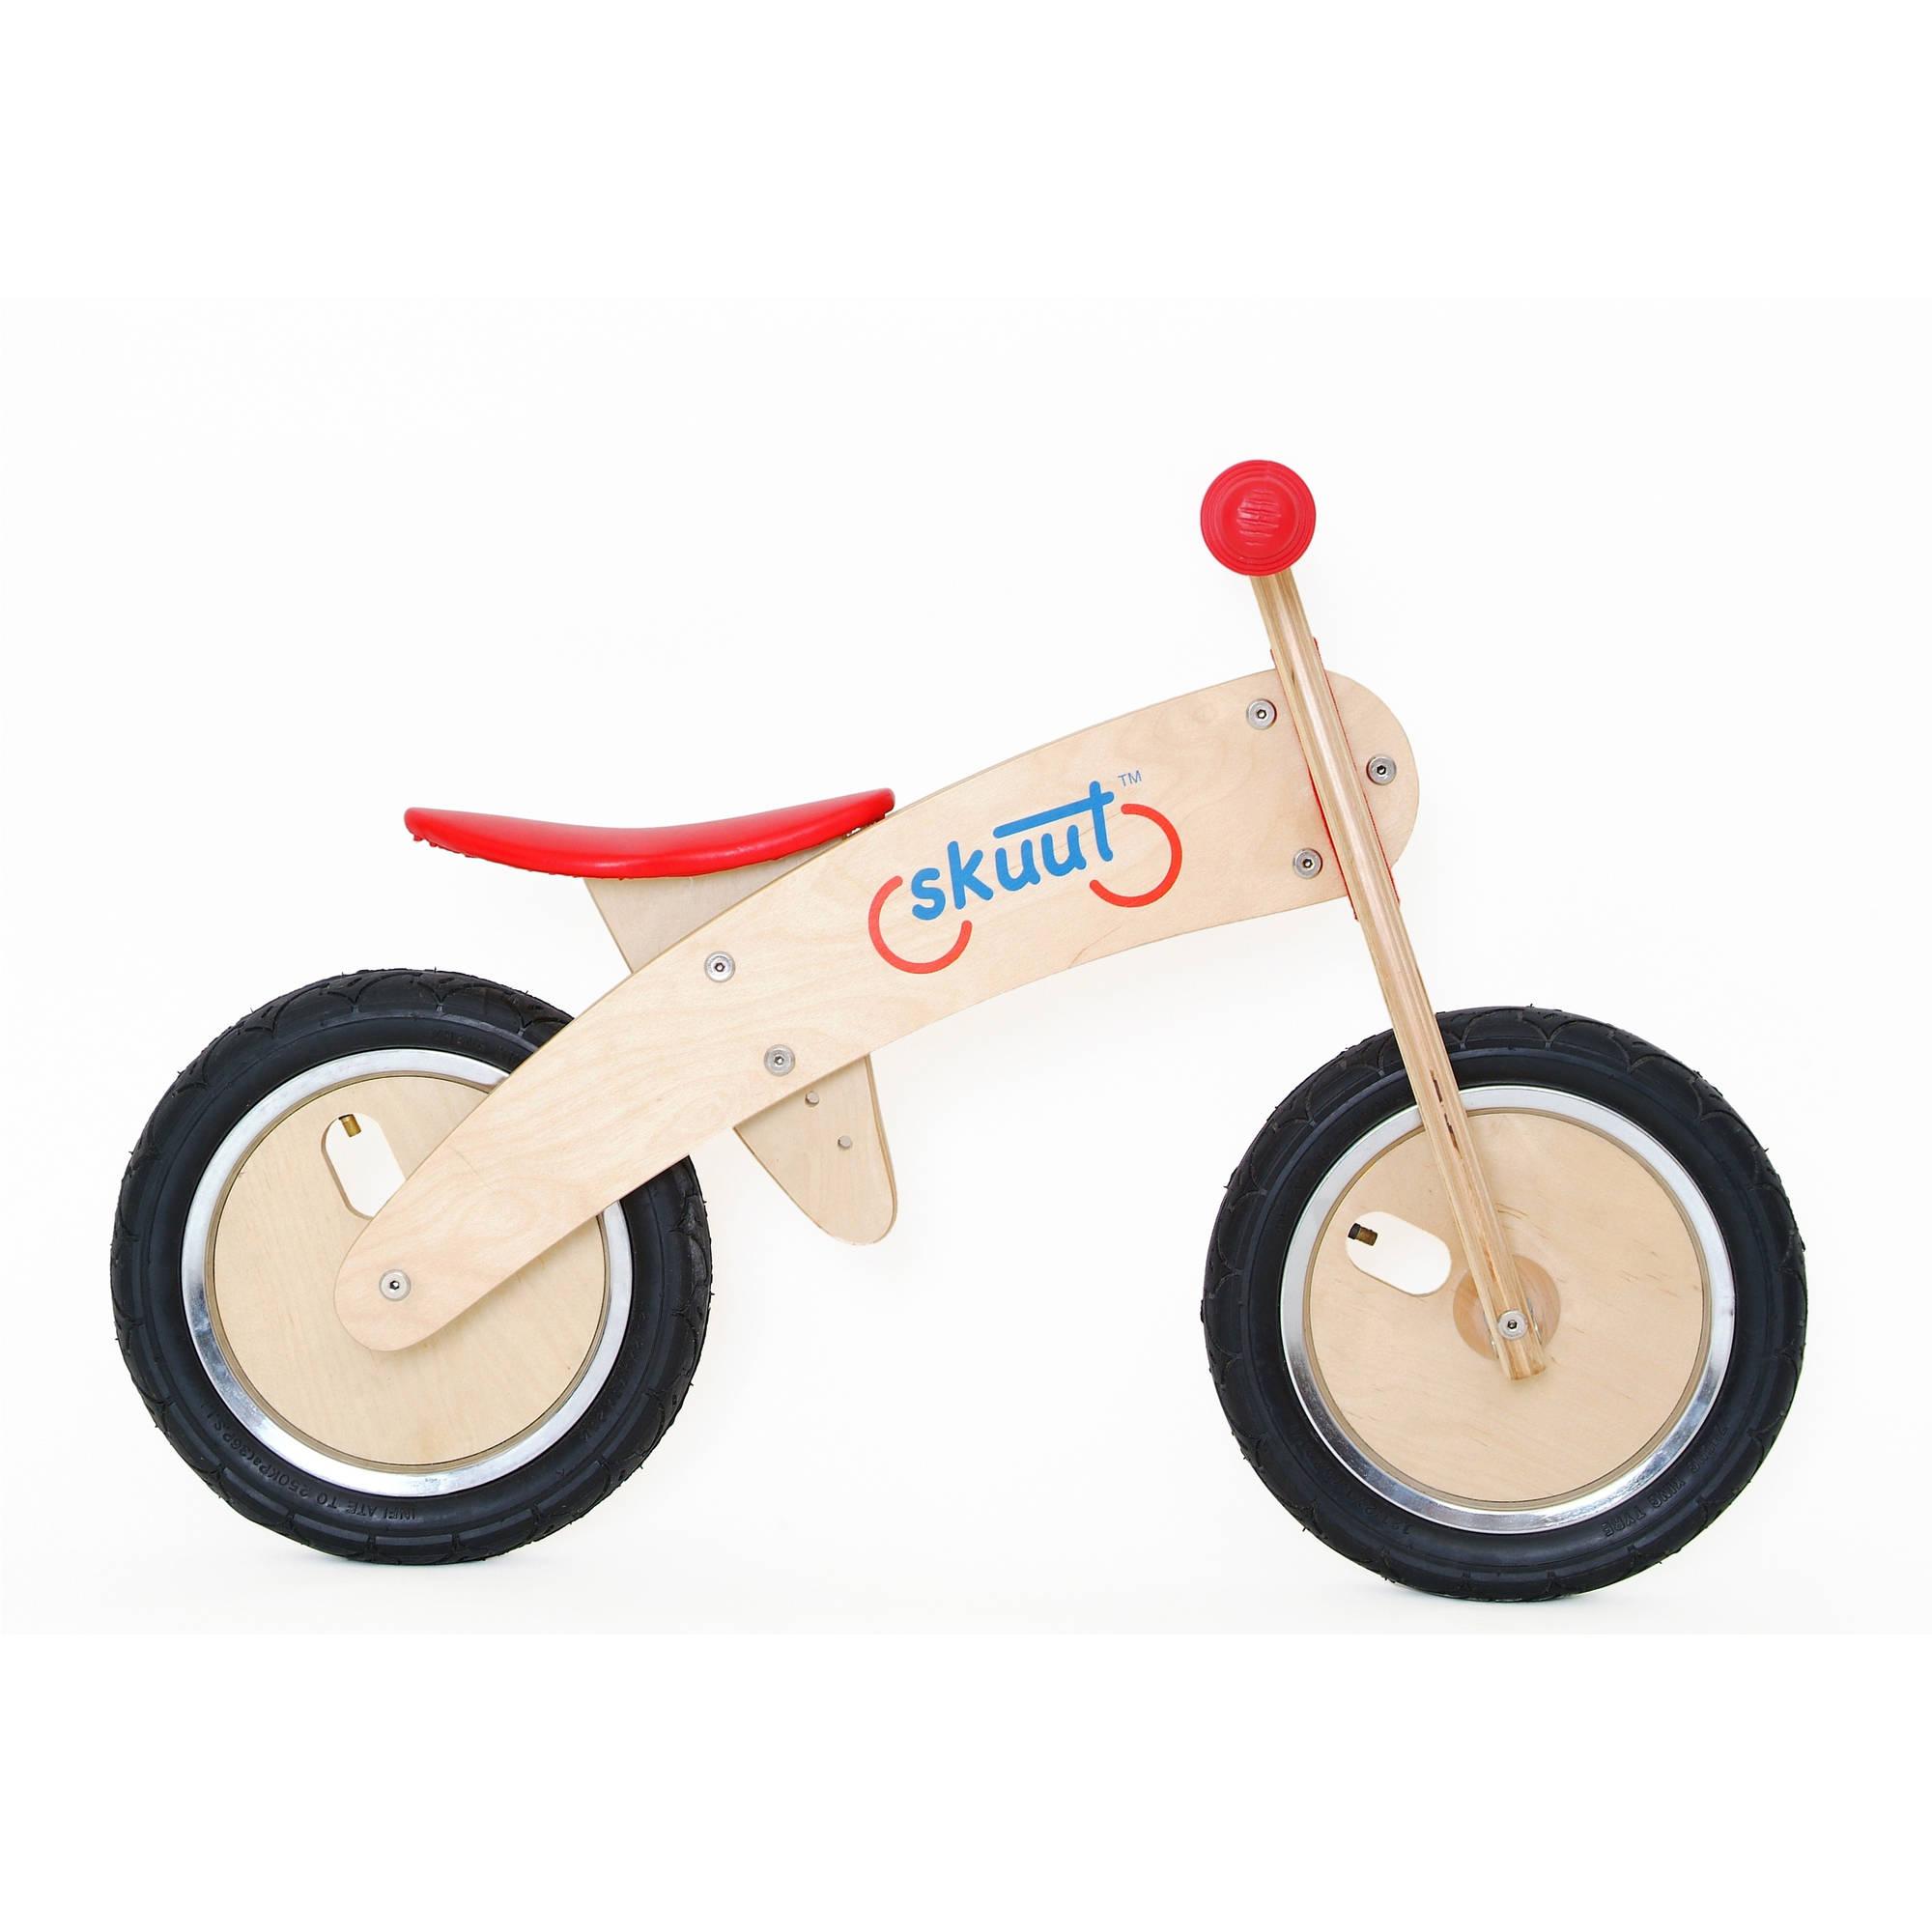 Diggin Active Red Skuut Wooden Balance Bike